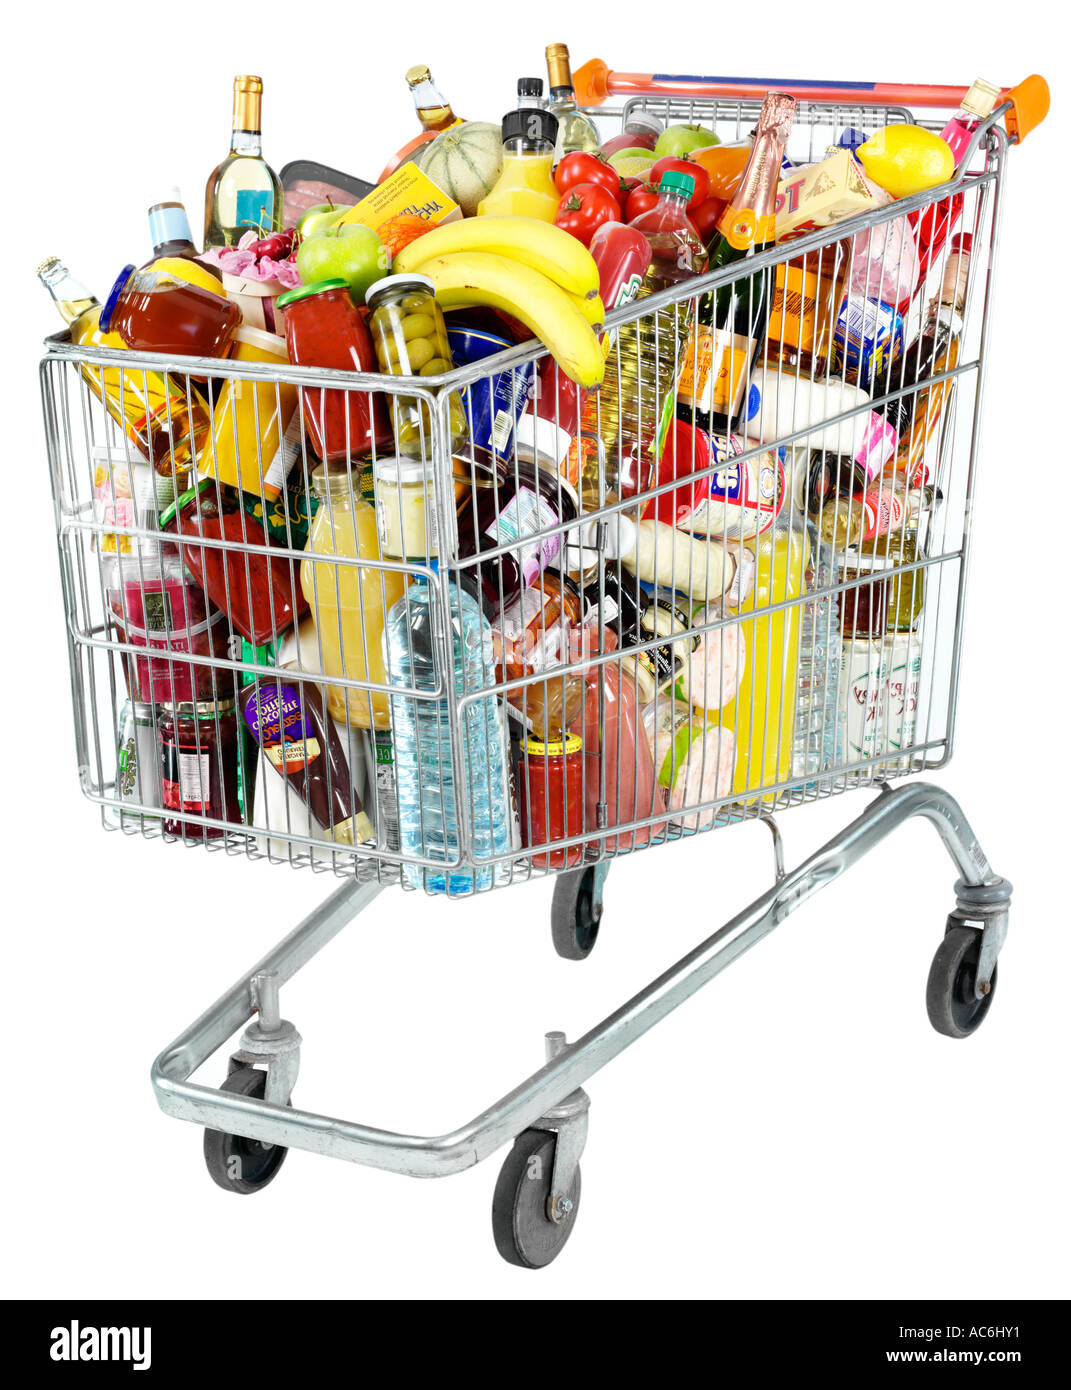 shopping-trolley-grocery-cart-AC6HY1.jpg